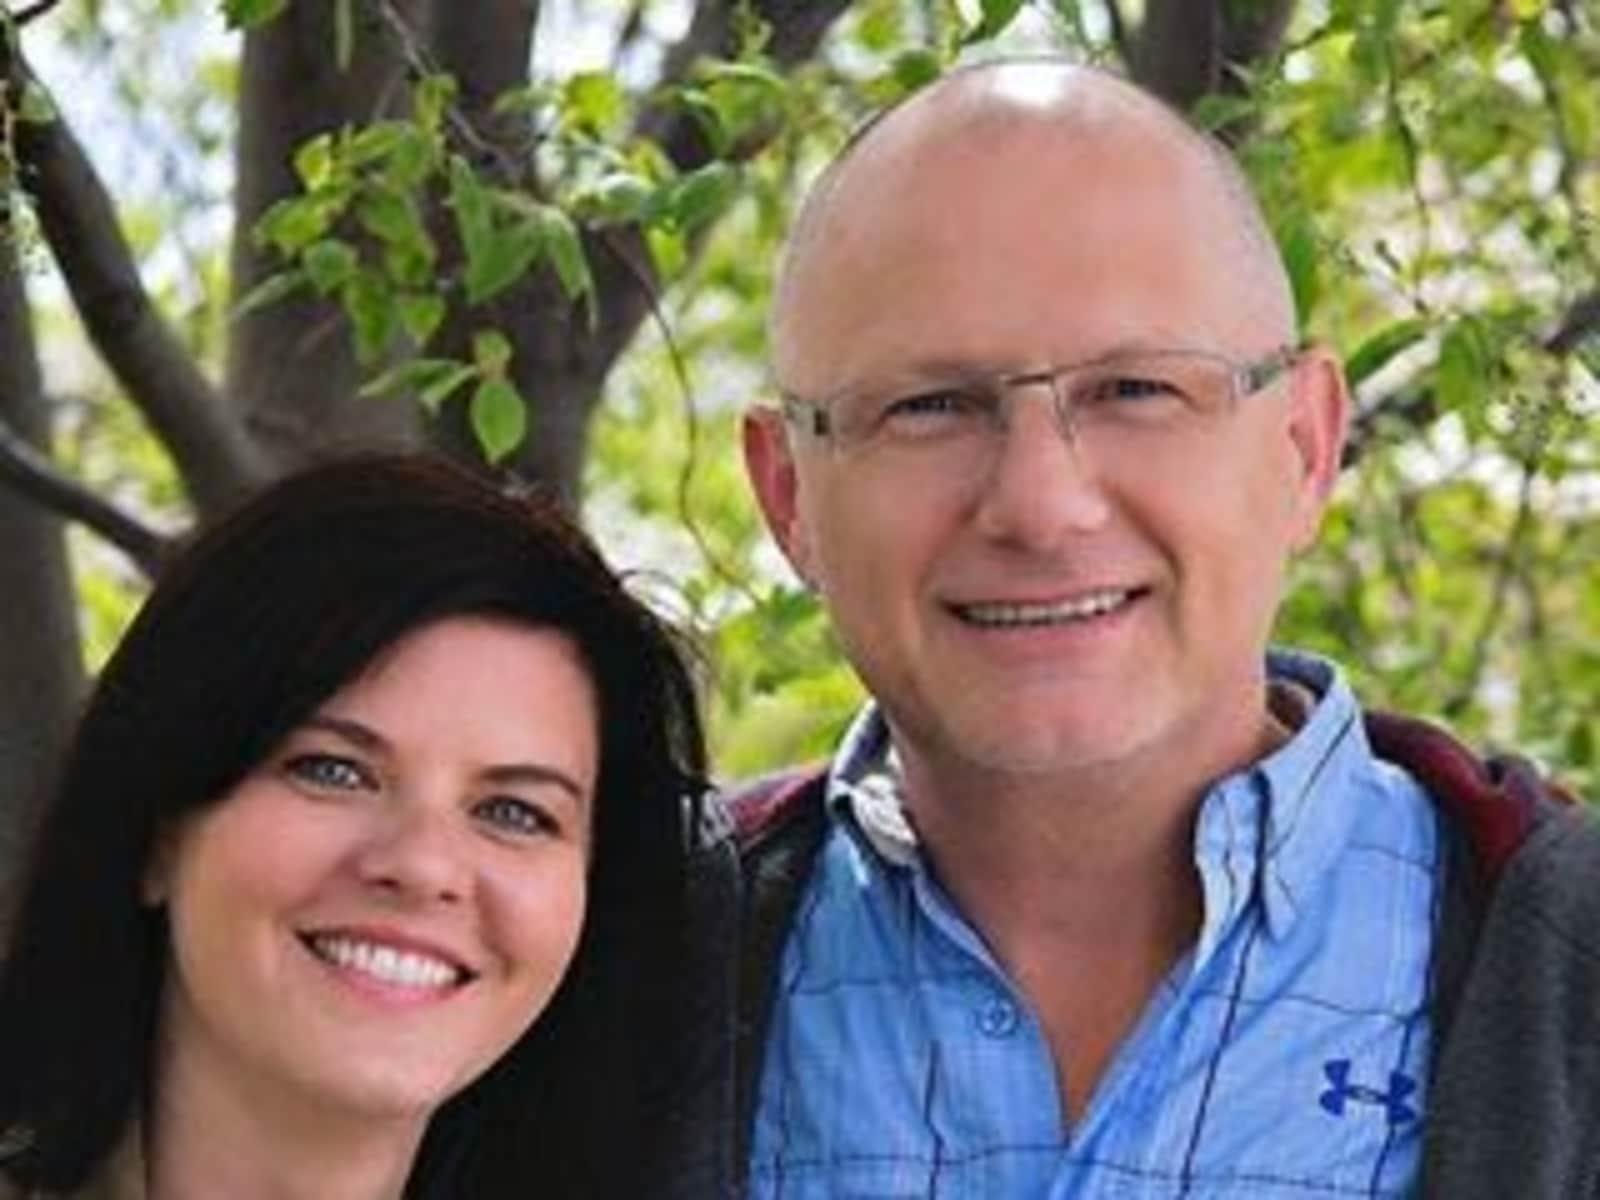 Kathy & Dean from Calgary, Alberta, Canada